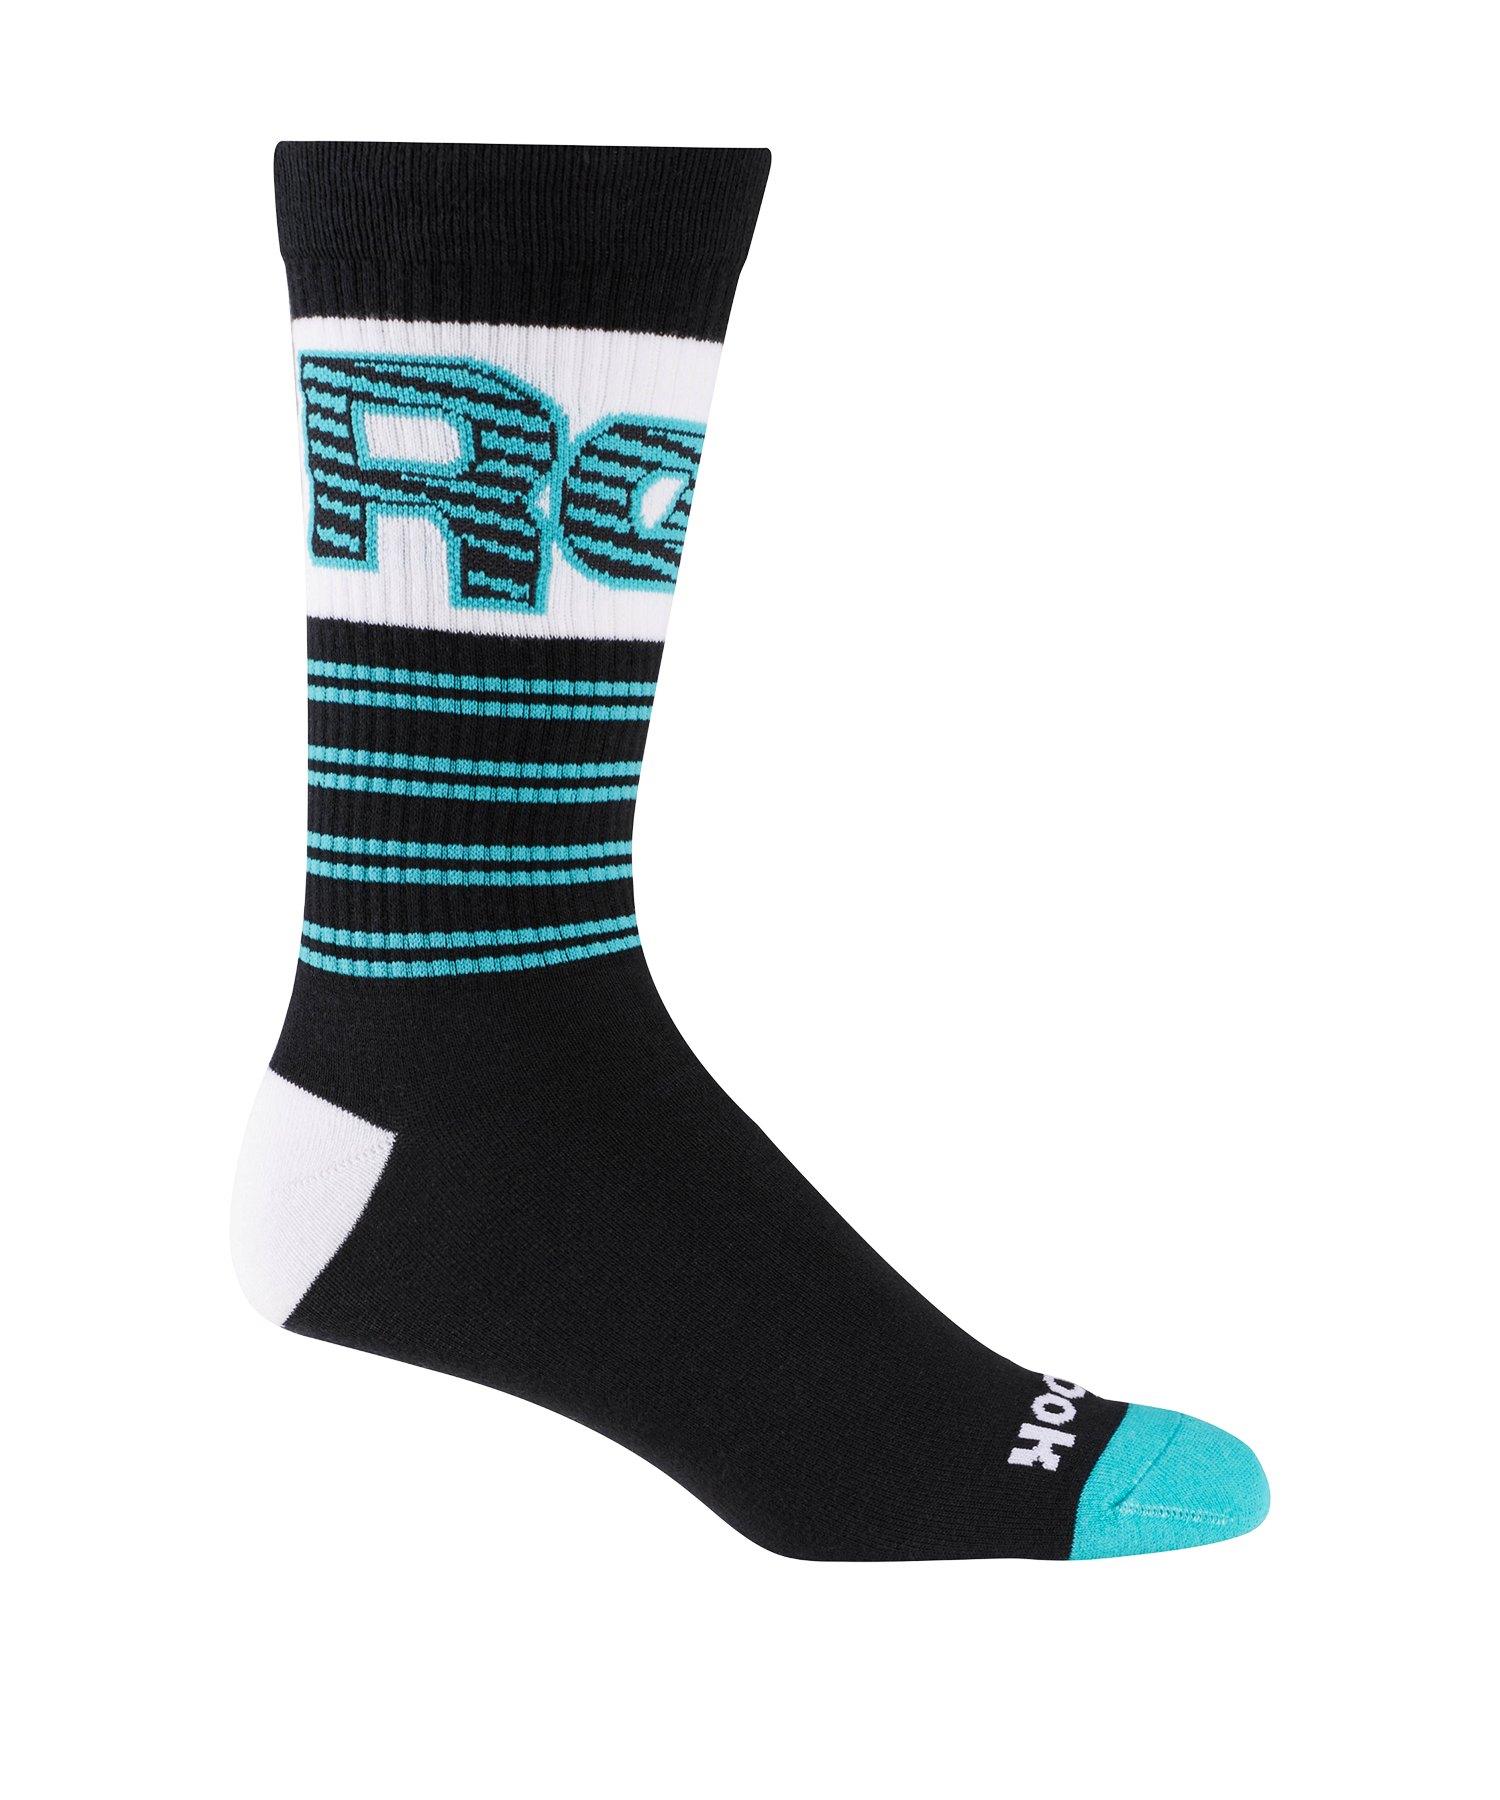 Reebok Classics Basketball Crew Socken Schwarz - schwarz